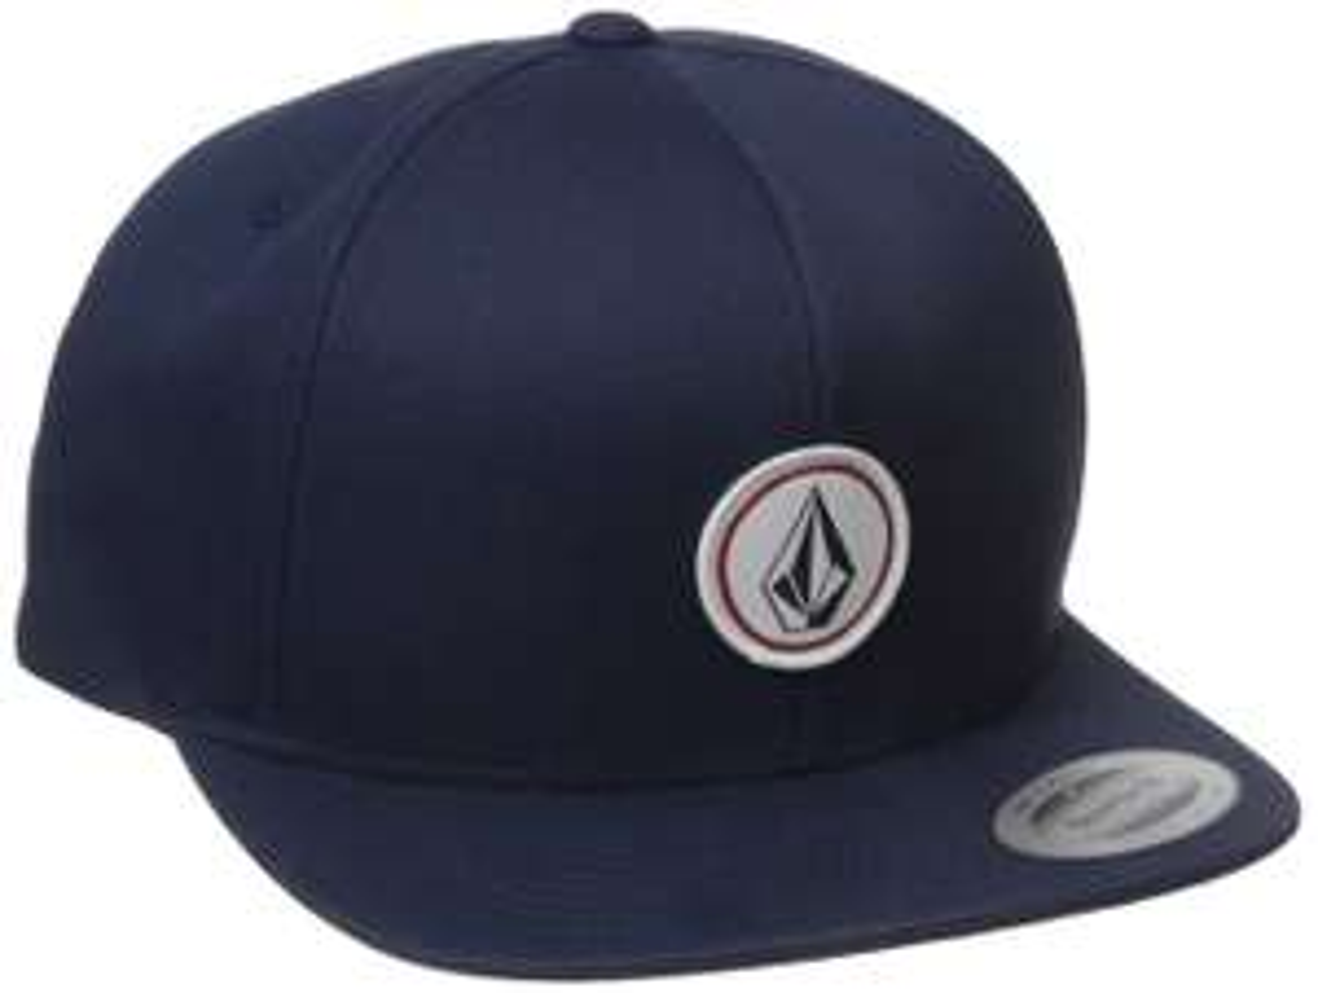 Volcom Herren Baseballmütze Quarter Twill, Smokey Blue, One size für 15,56€ statt 31,50€ [Amazon Prime]